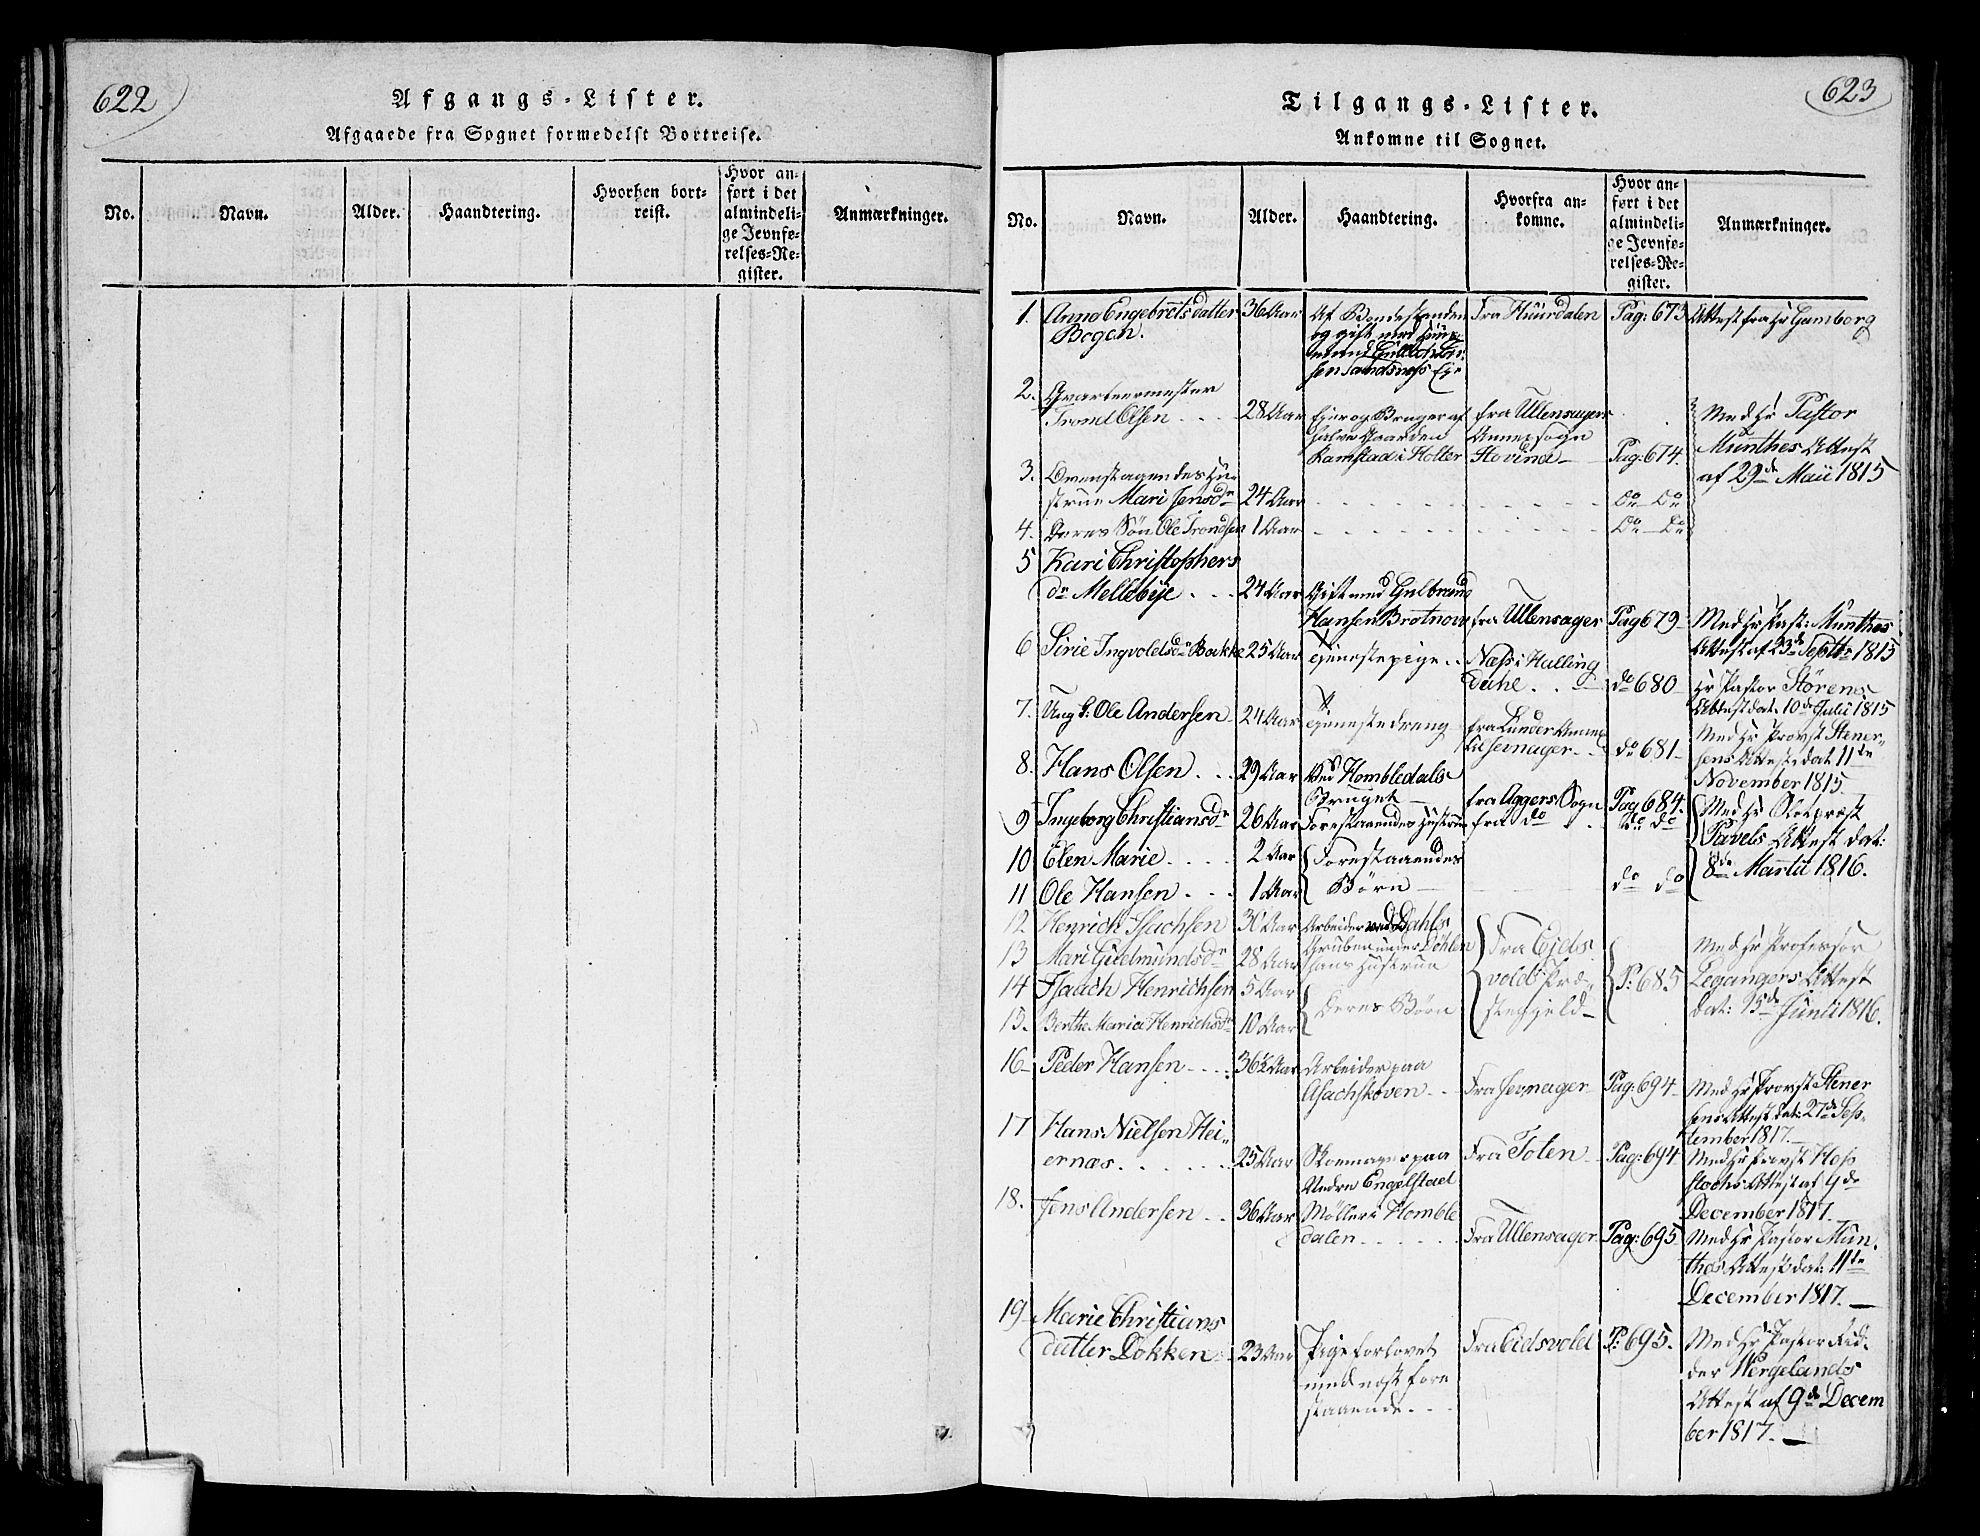 SAO, Nannestad prestekontor Kirkebøker, G/Ga/L0001: Klokkerbok nr. I 1, 1815-1839, s. 622-623